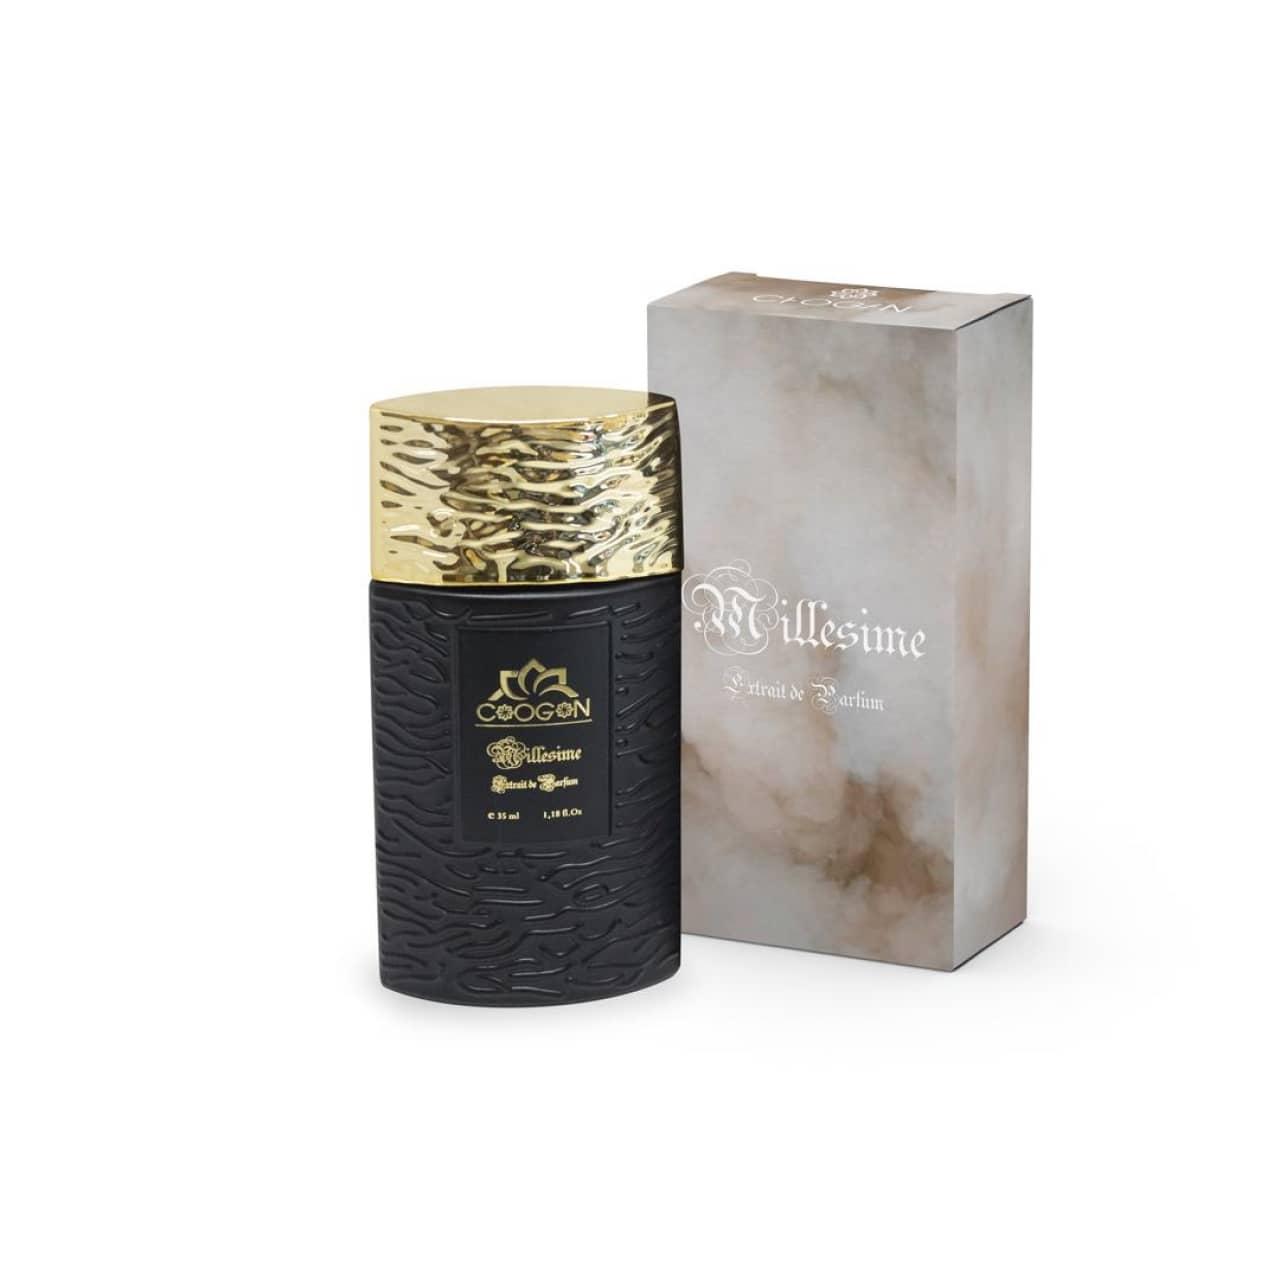 Parfum unisexe réf 072-35ml